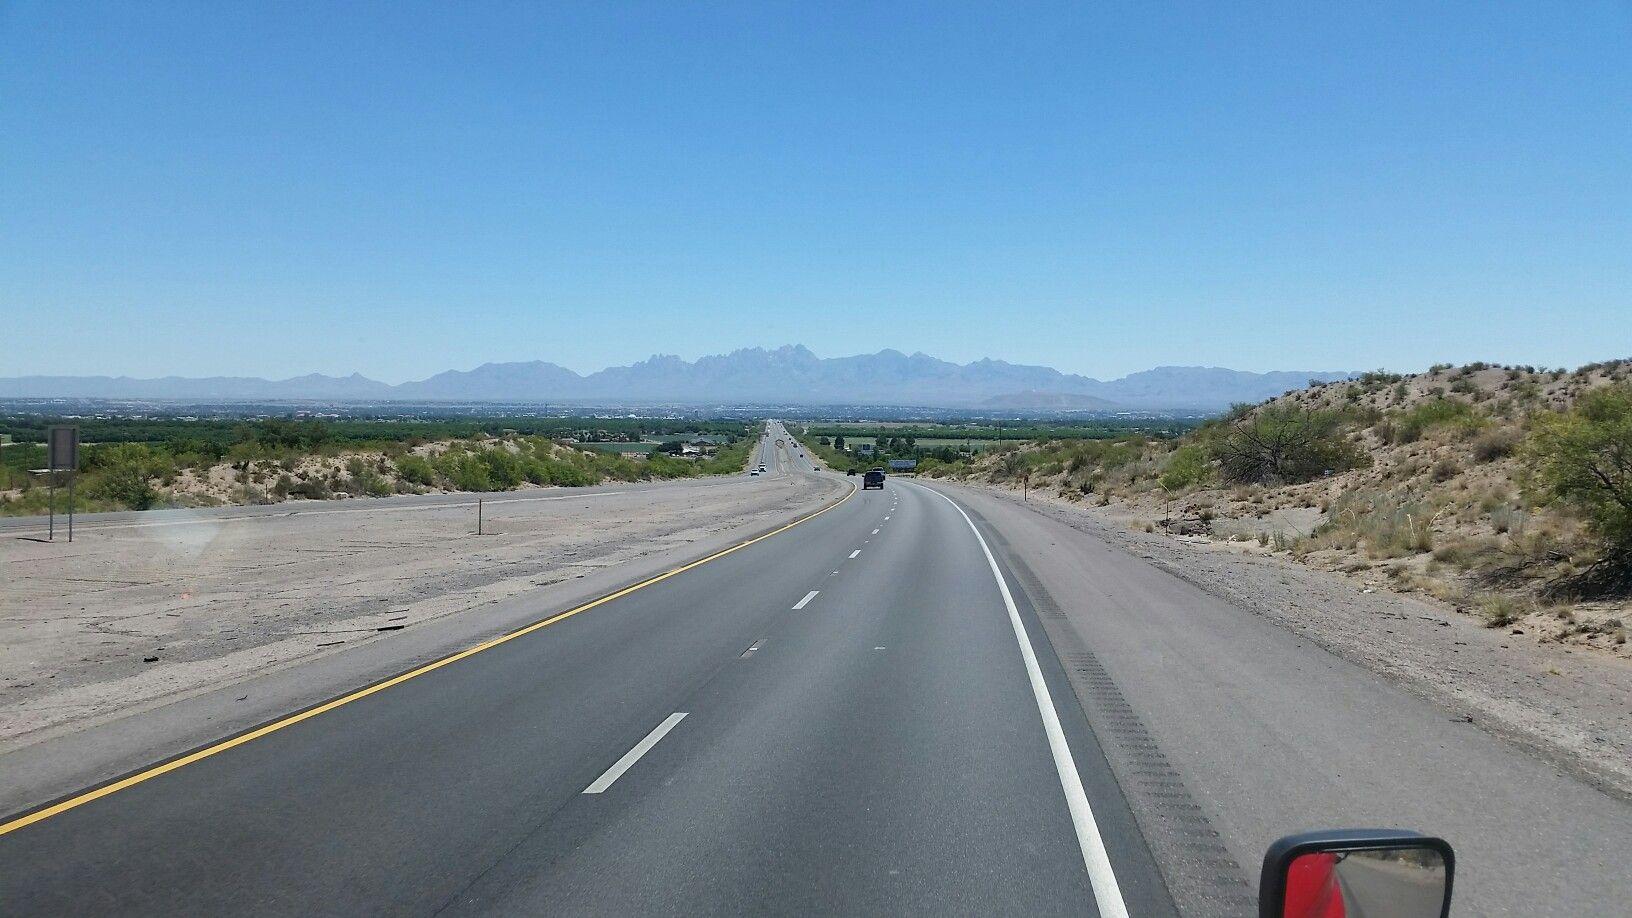 Cruisin' into Las Cruces